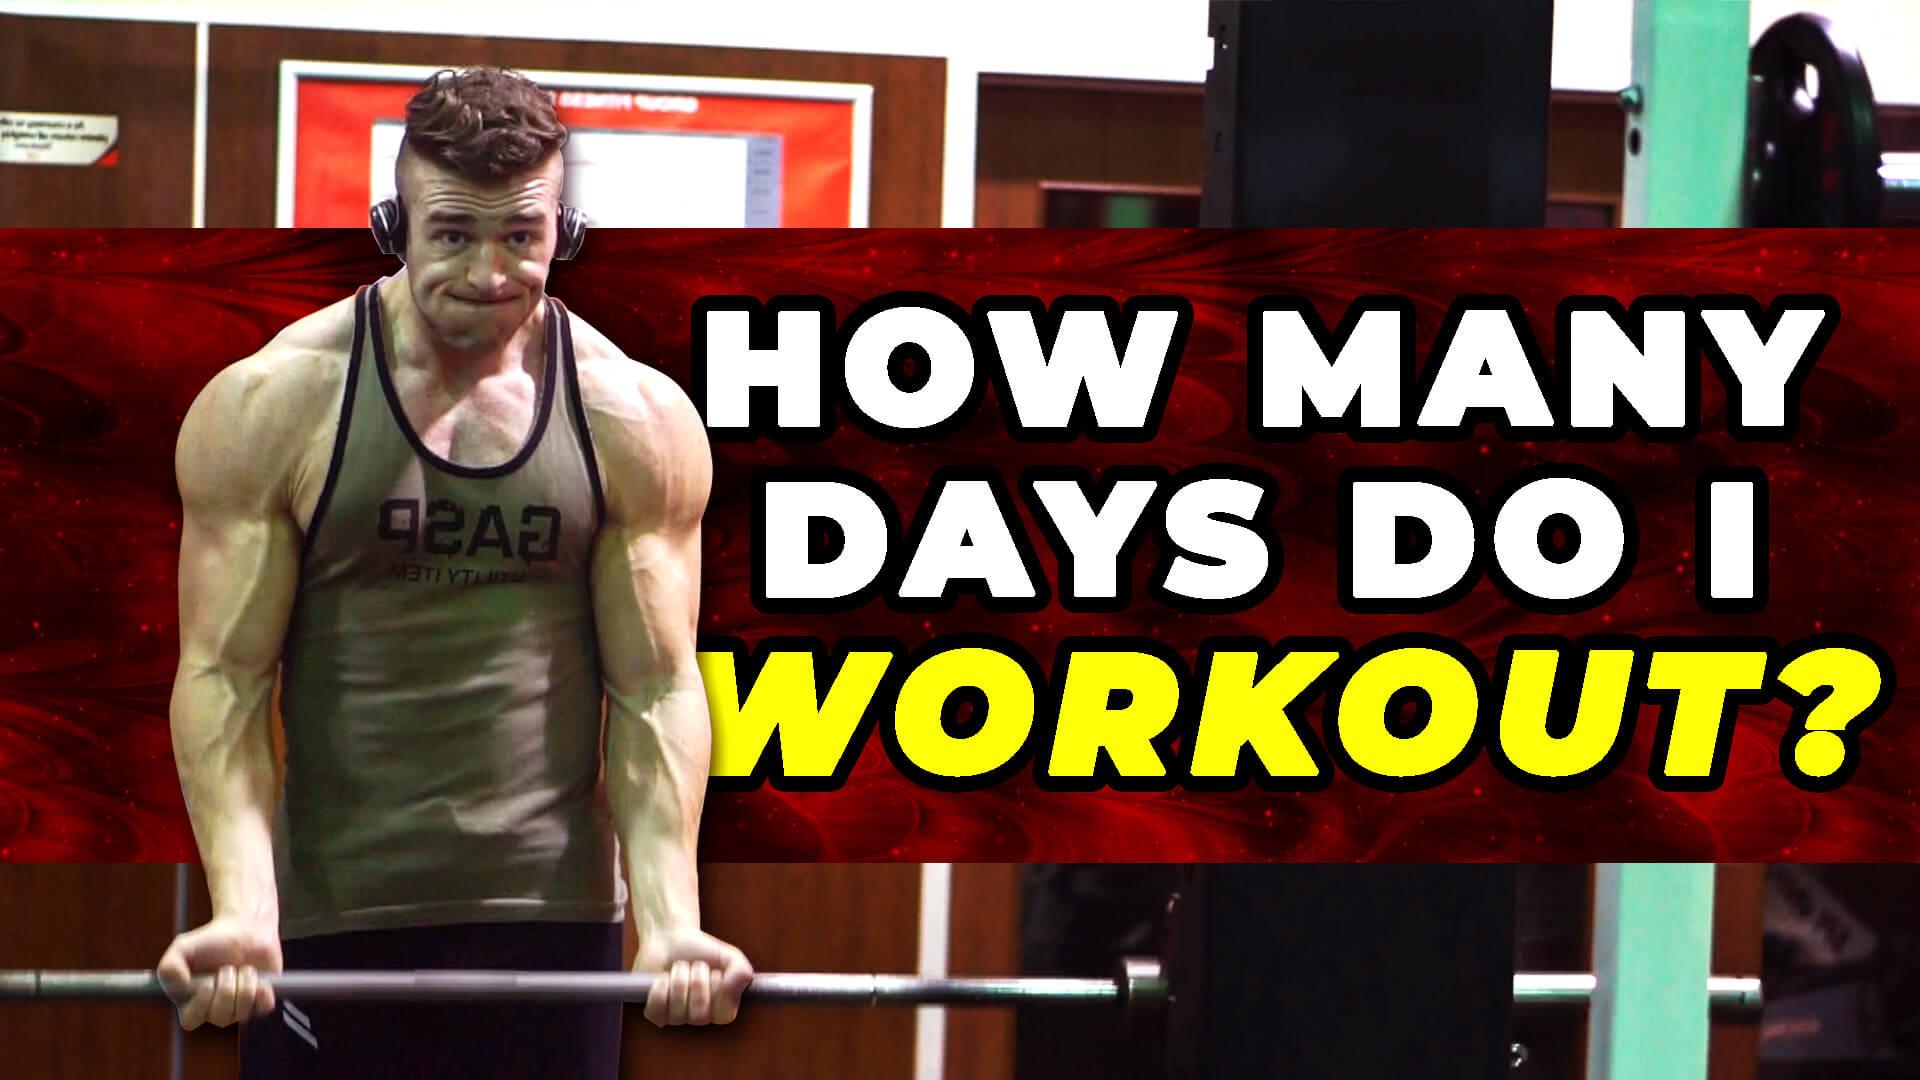 How Many Days Do I Workout?